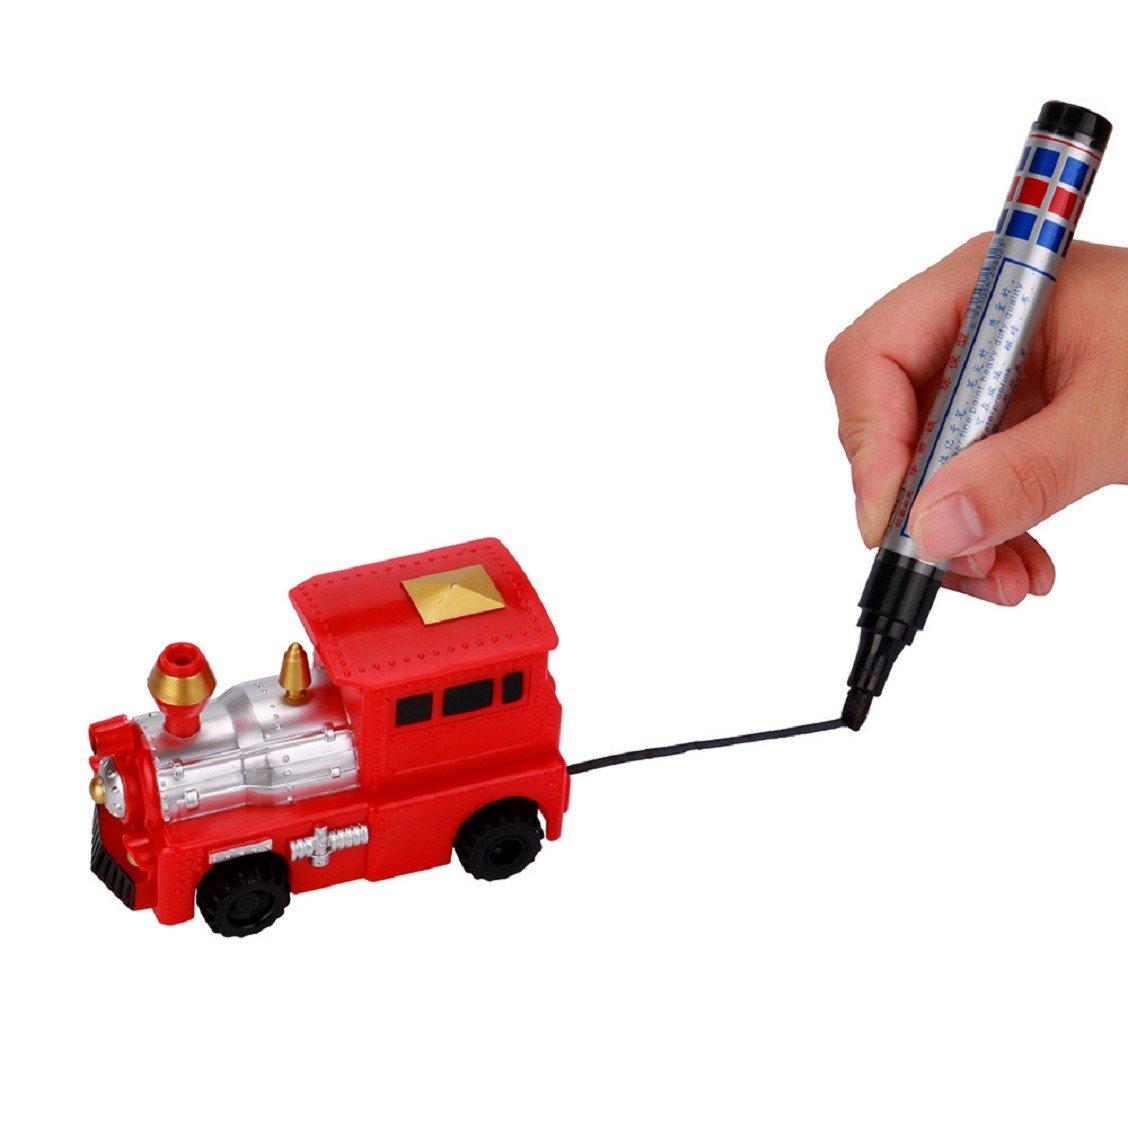 Naladoo 1PC Follow any Drawn Line Magic Pen Inductive Toy Car Truck Bus Tank Model Toy (B)